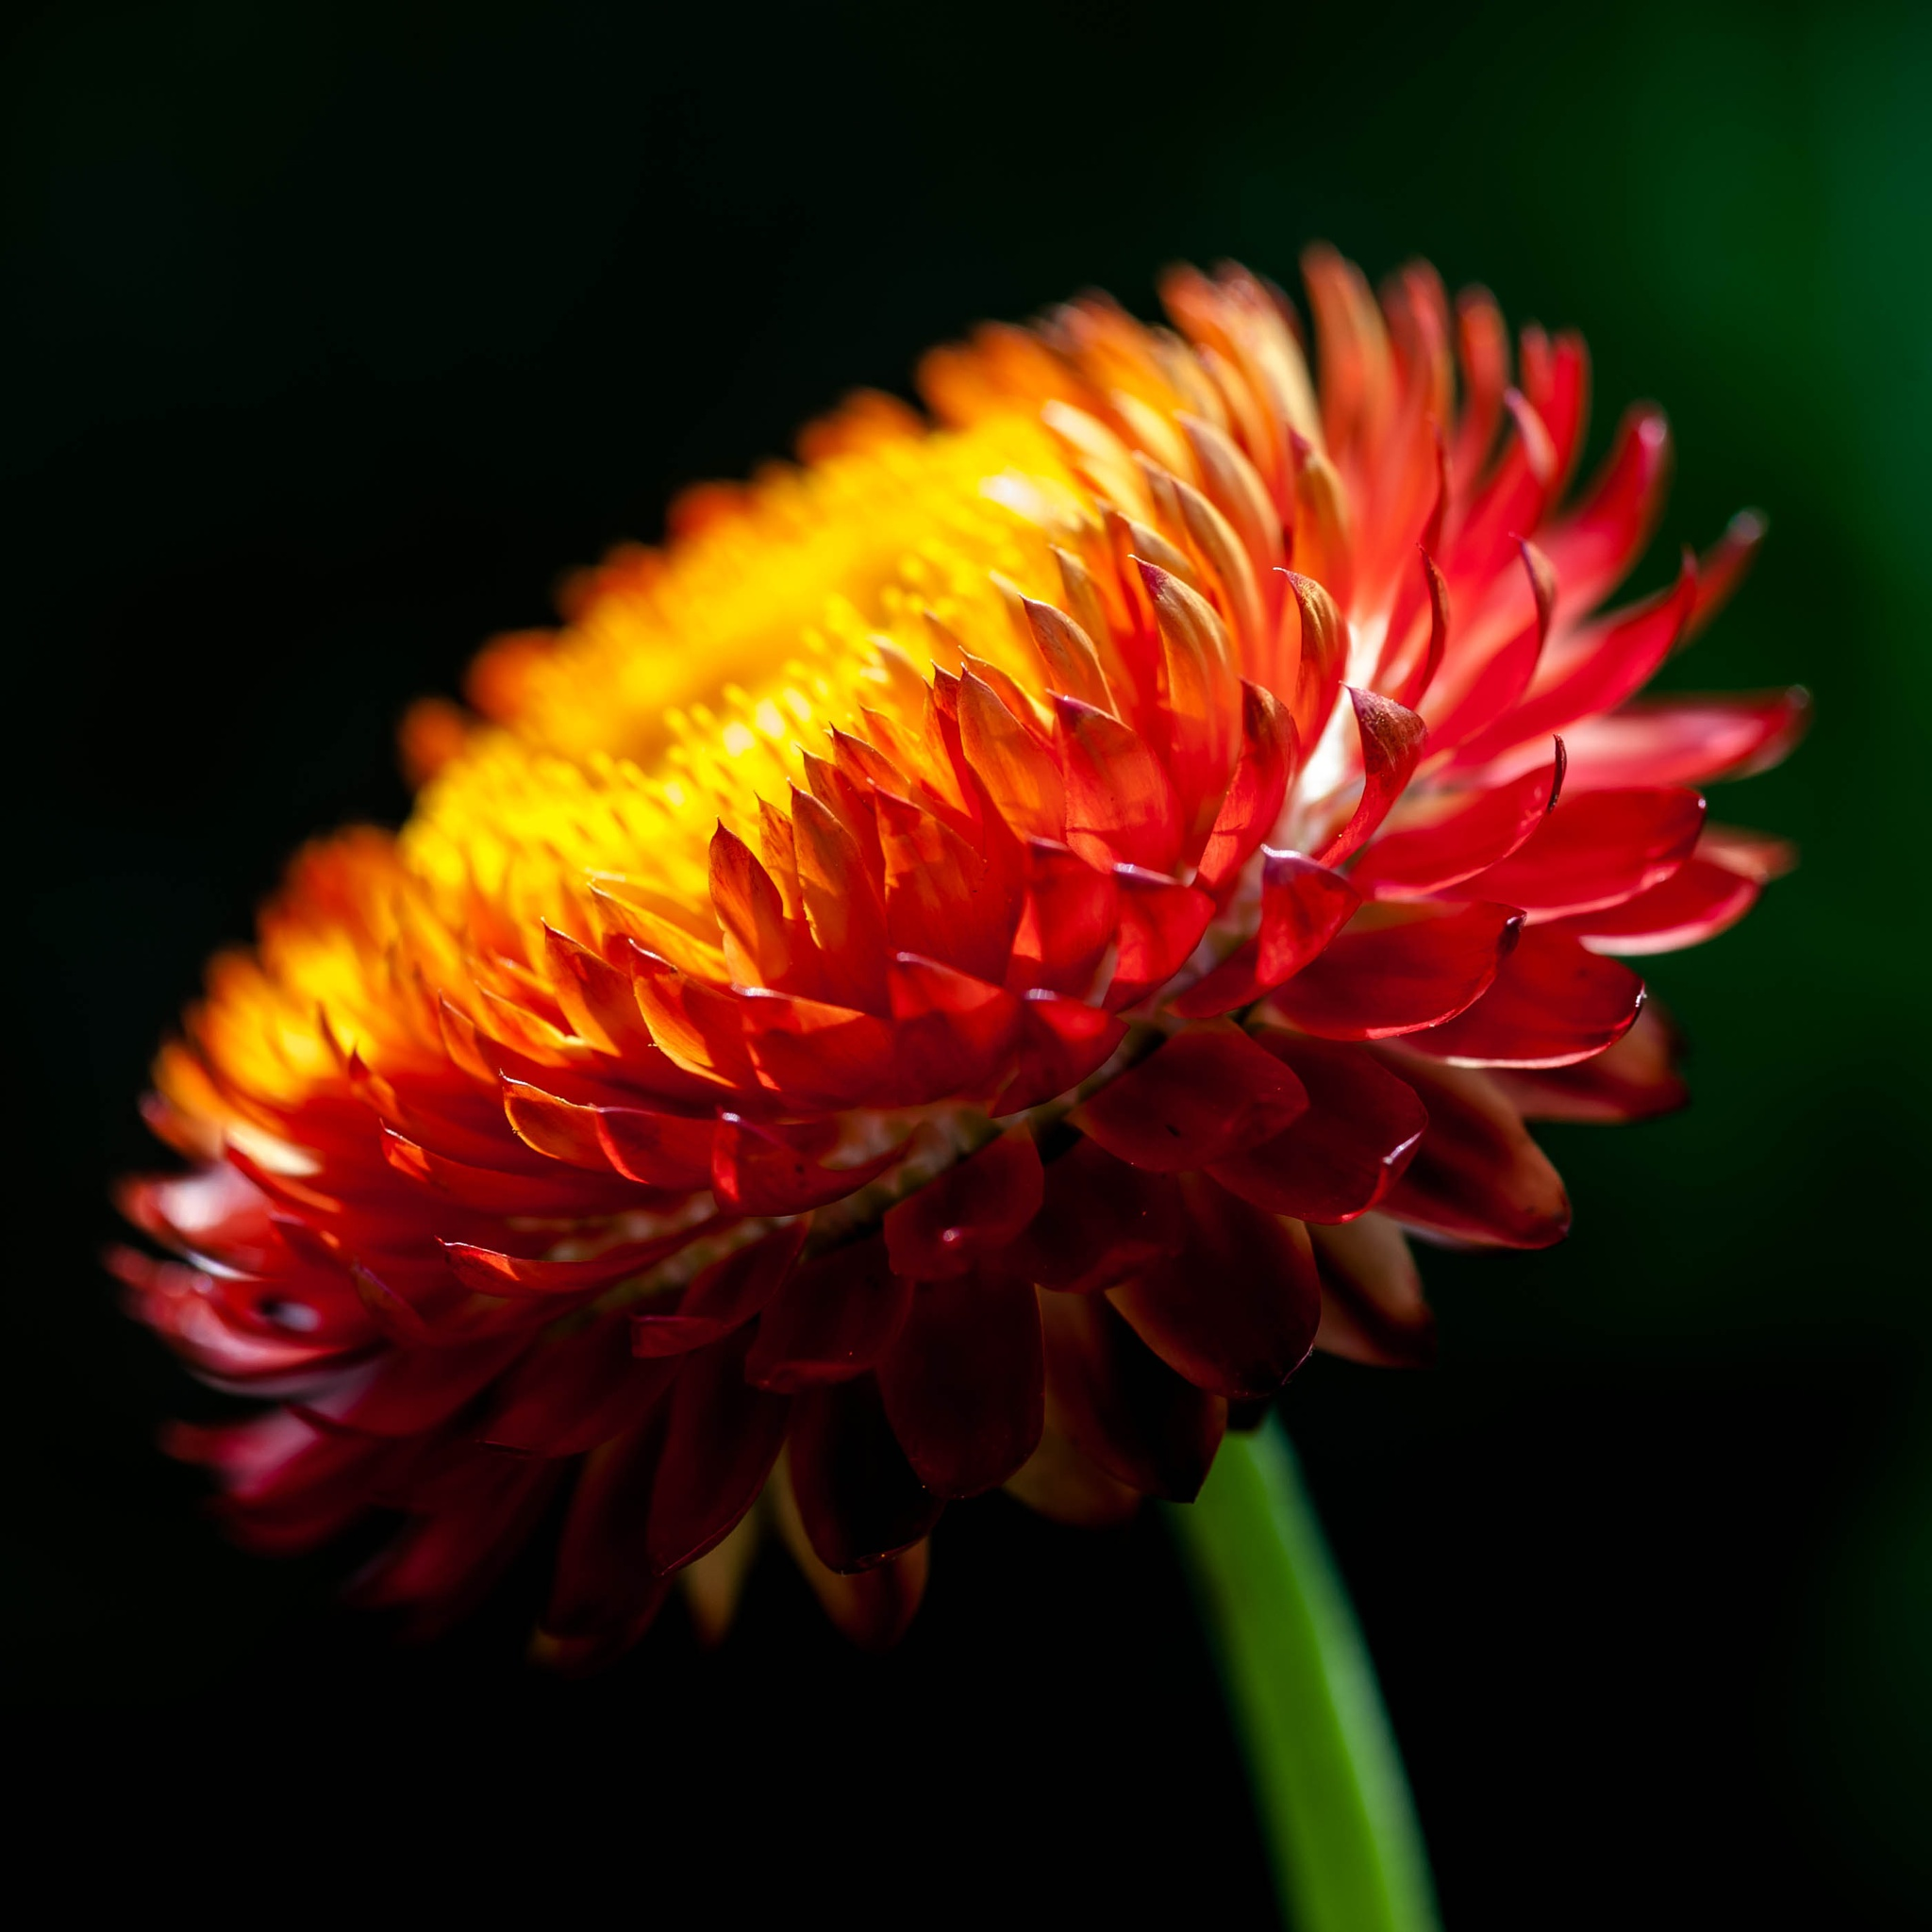 strohblume by Stephan Winkler